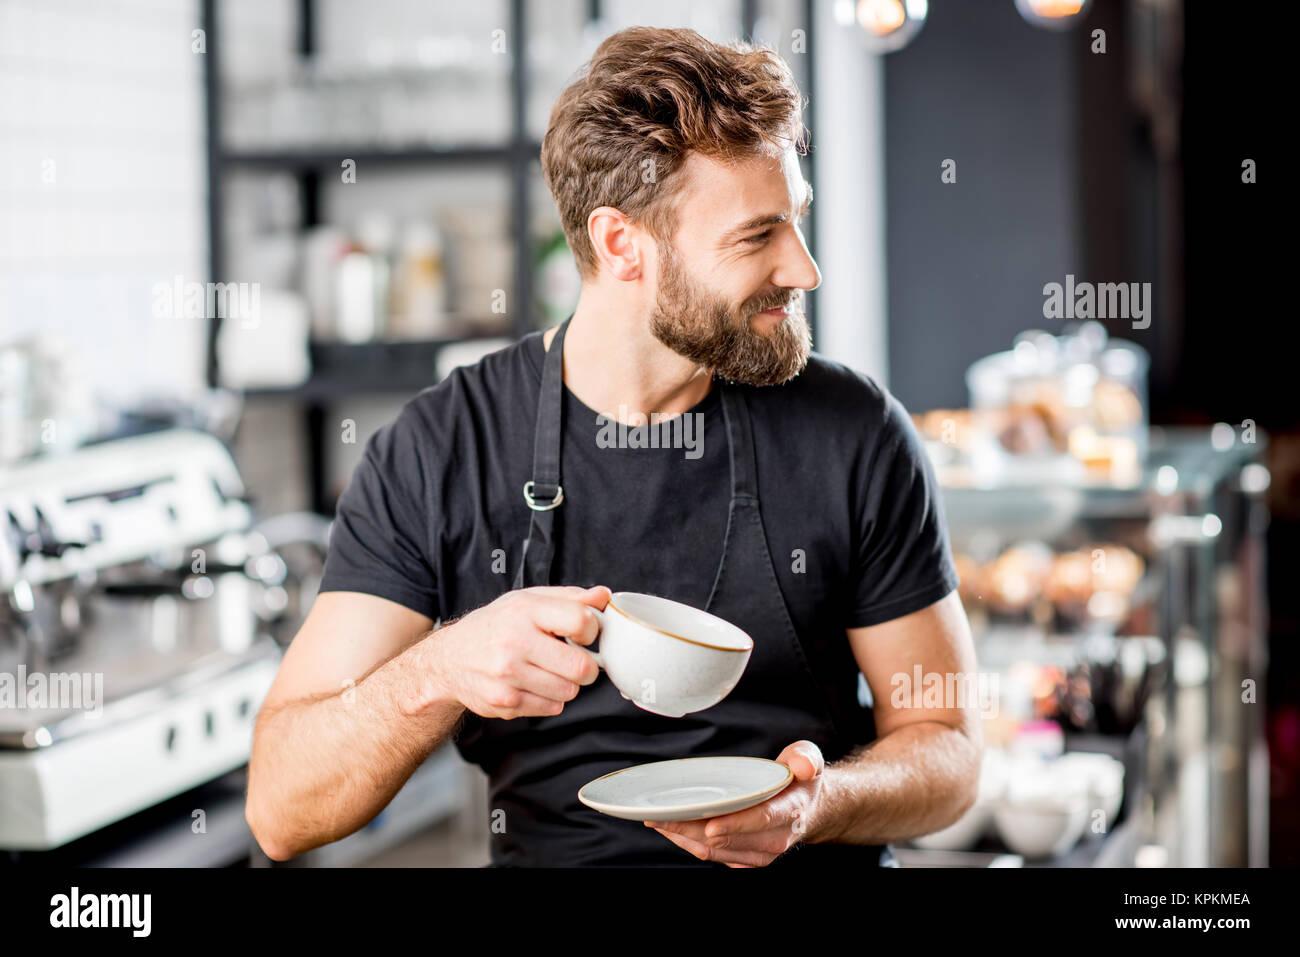 Barista Portrait im Cafe Stockbild